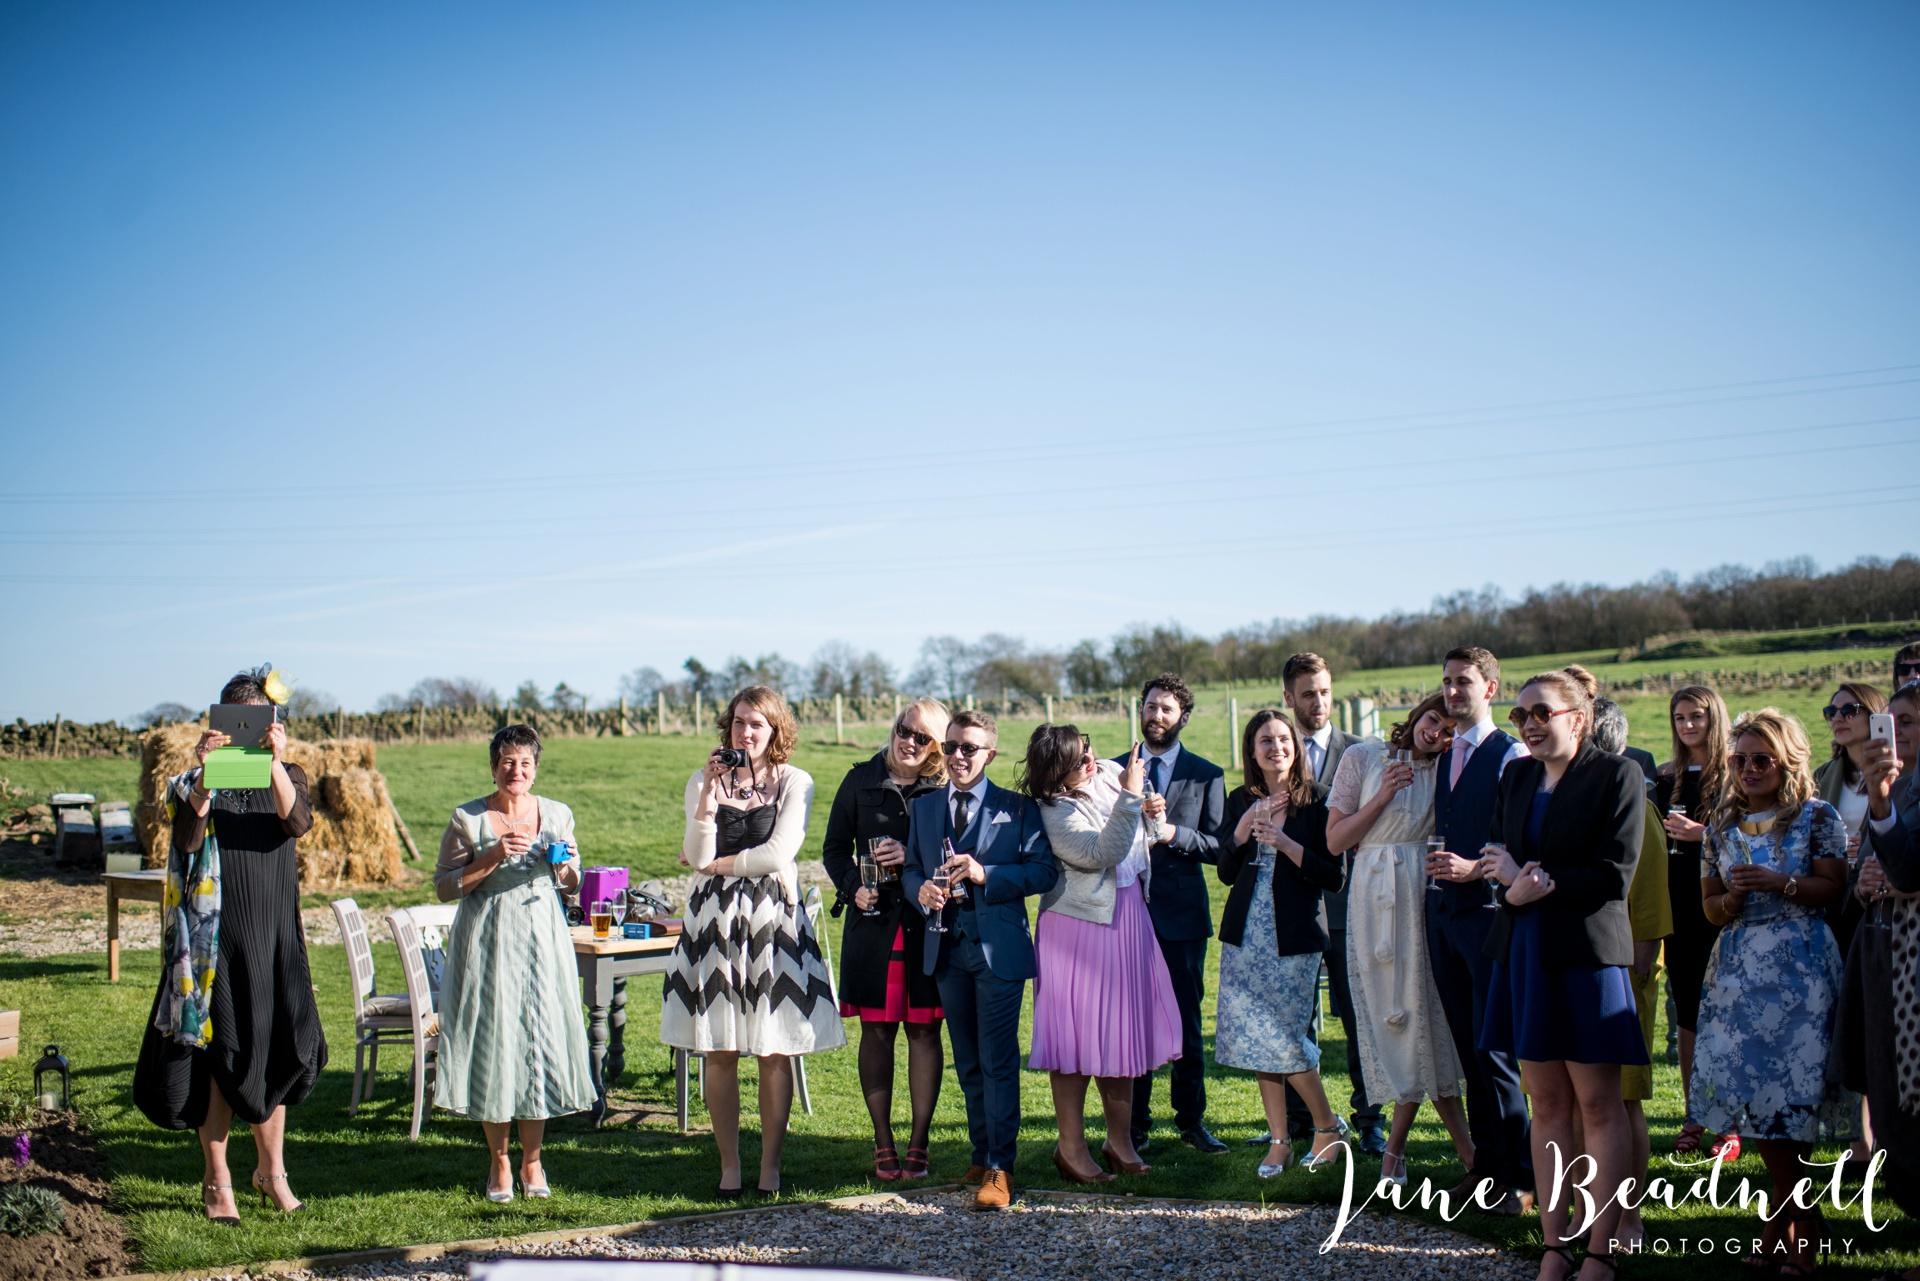 Jane Beadnell fine art wedding photographer The Cheerful Chilli Barn Otley_0038